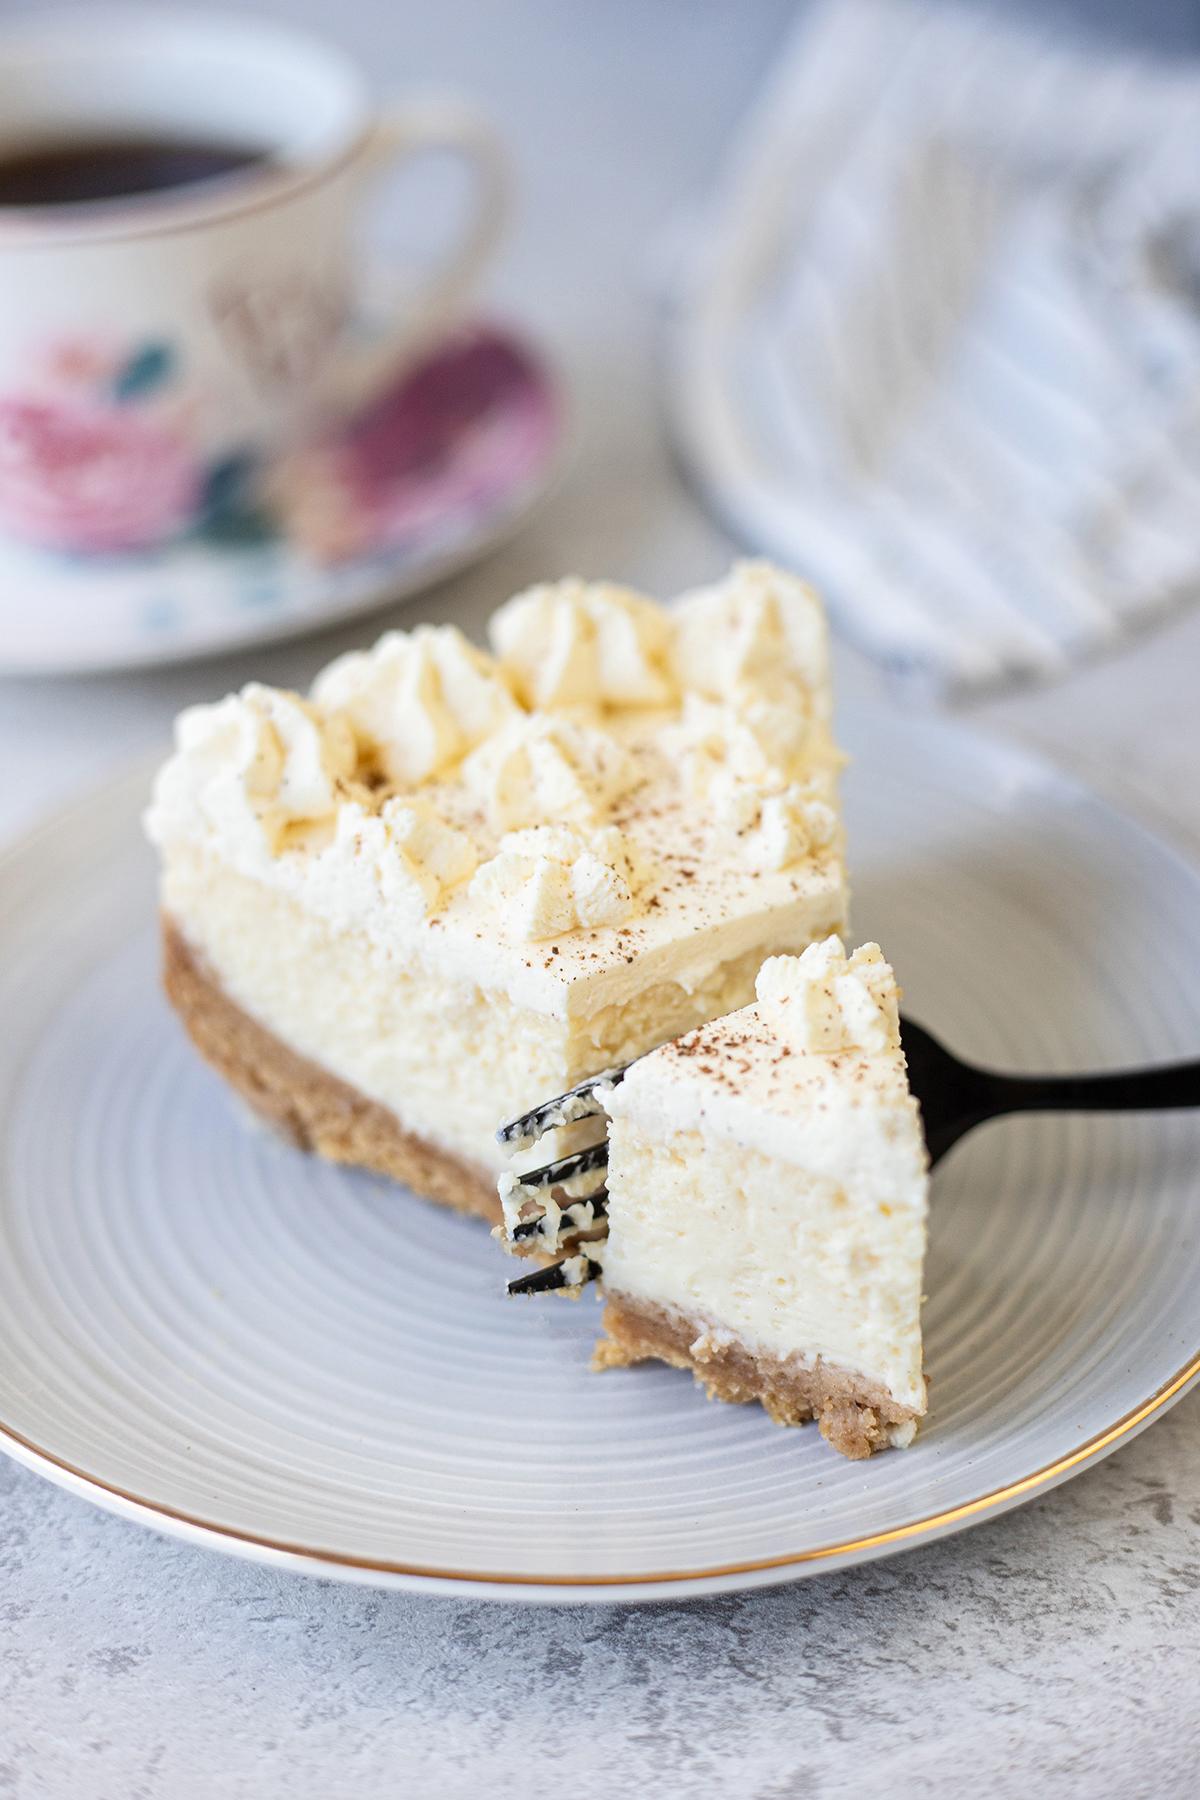 one pice of the cheesecake #eggnogcheesecake #easycheesecakerecipe #easydessertrecipe #eggnogrecipes